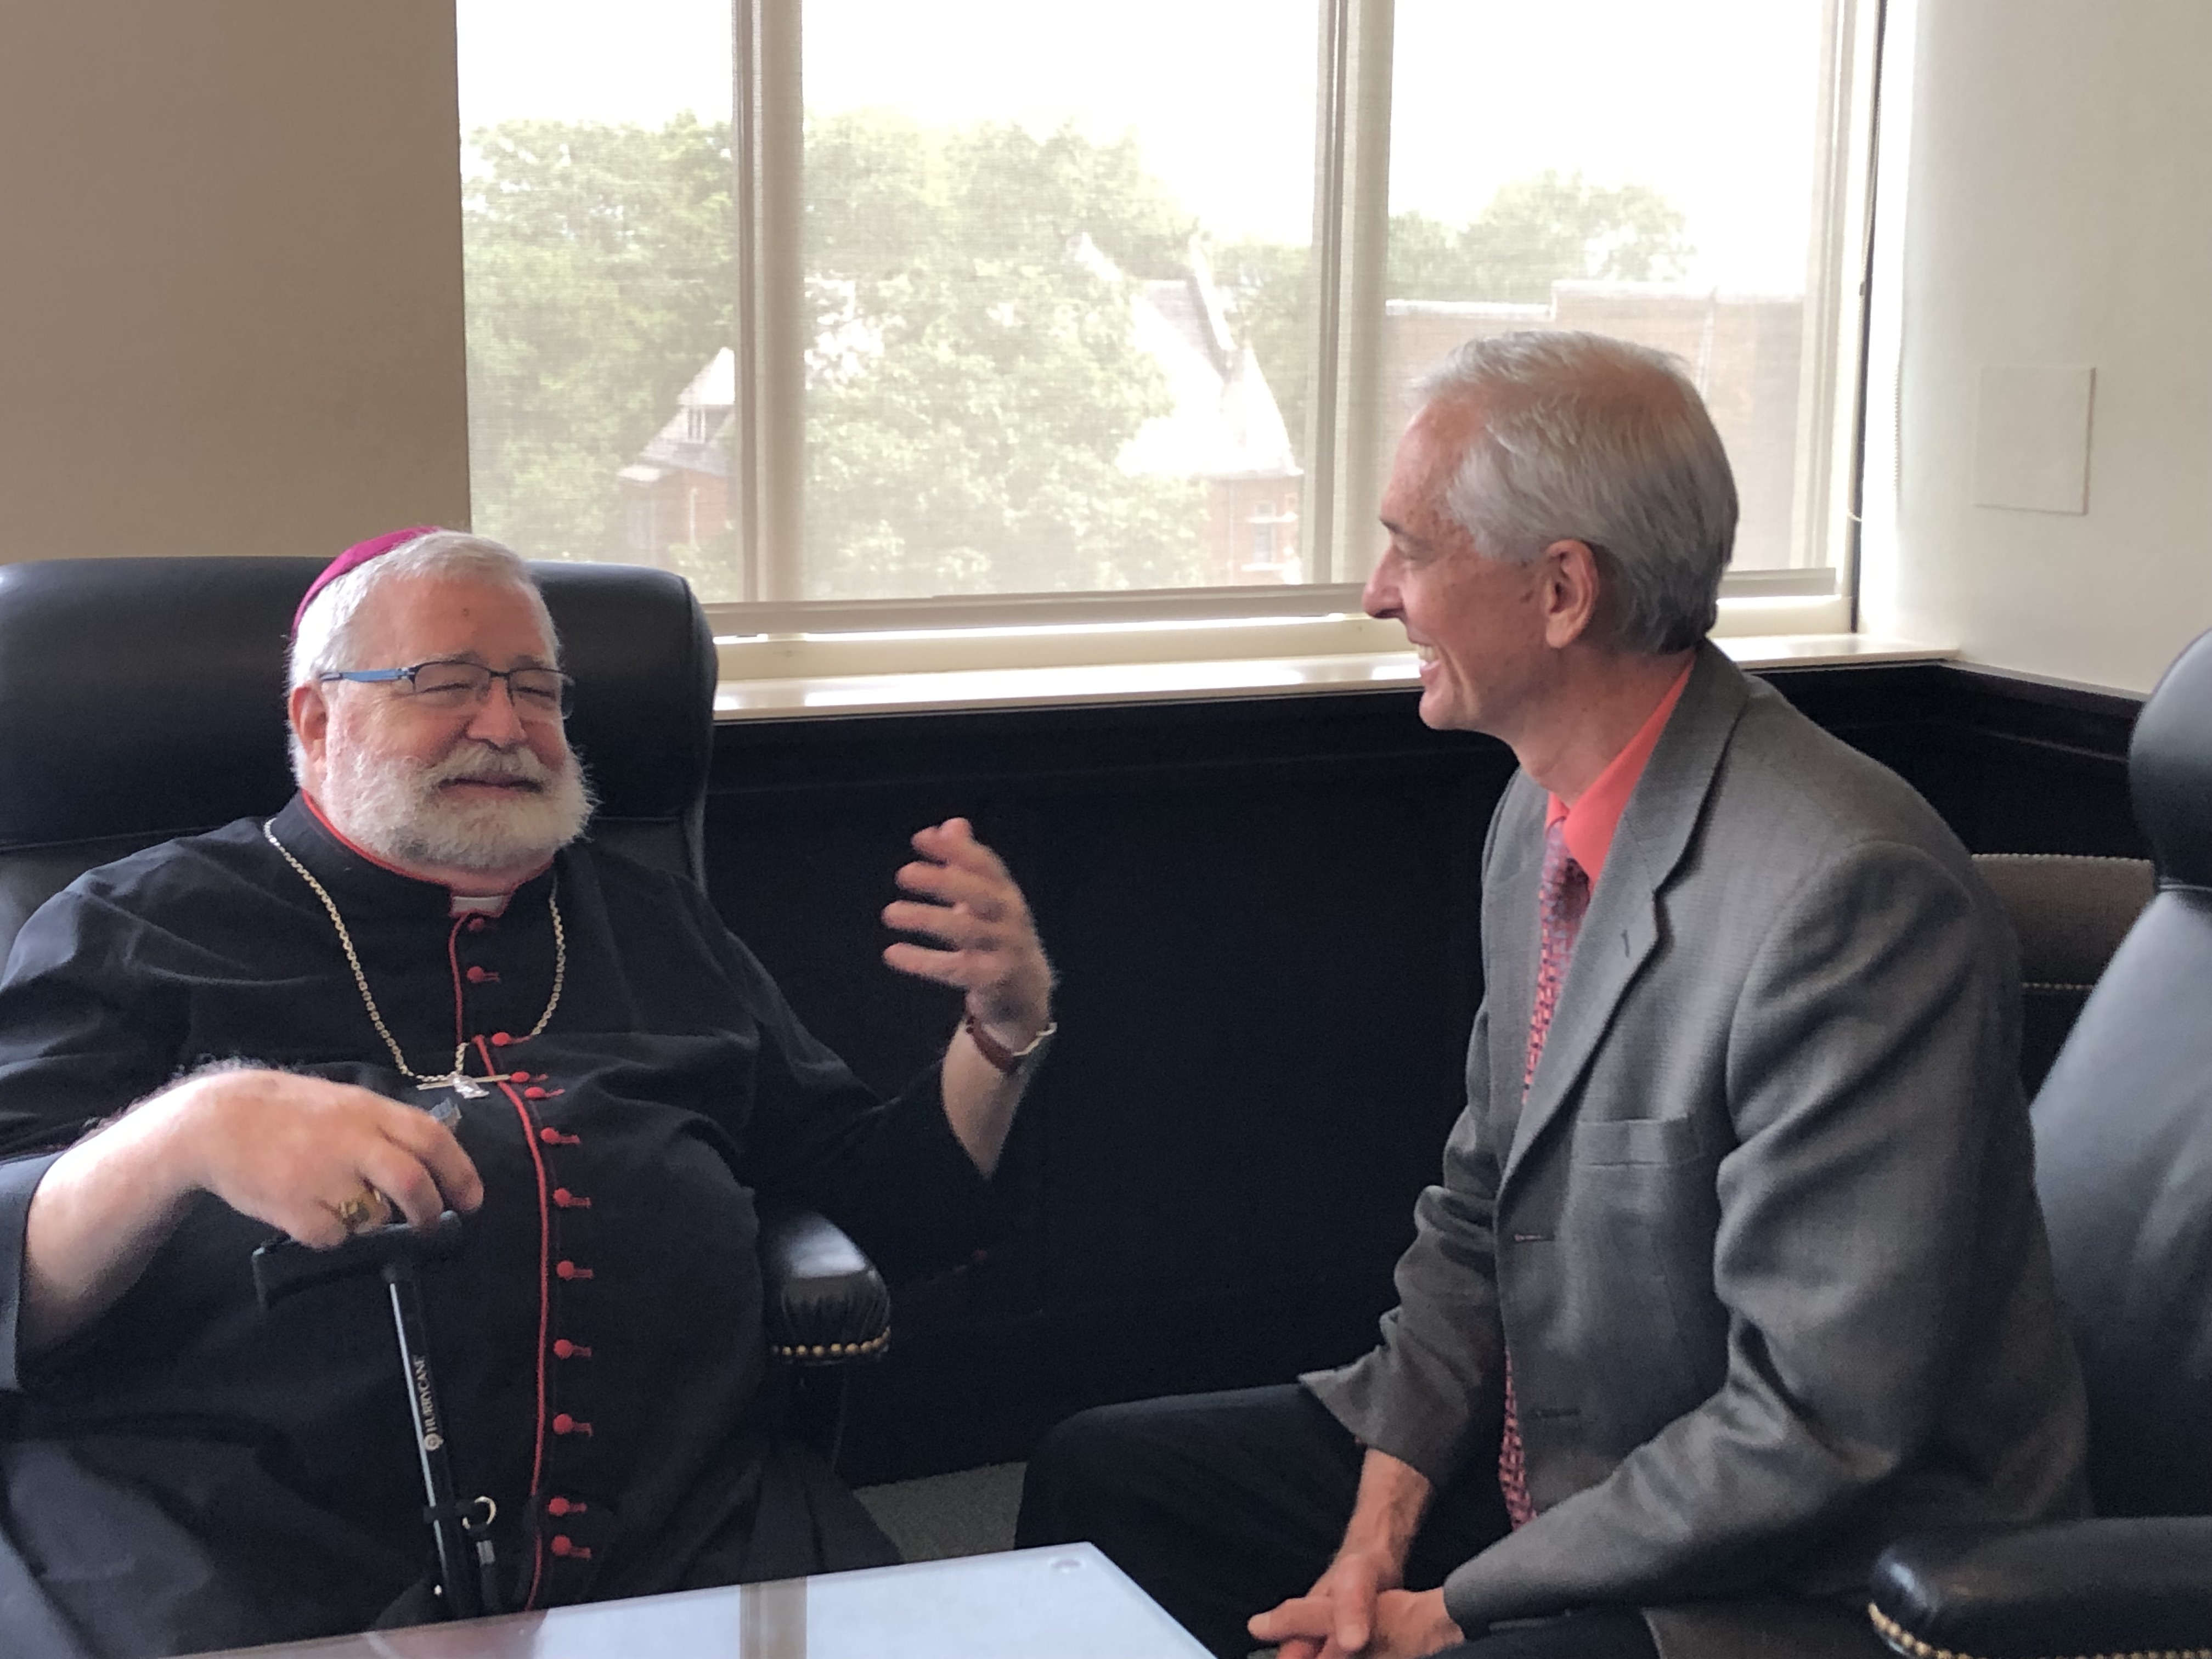 Bishop Jenky Diocese of Peoria IMG_5042